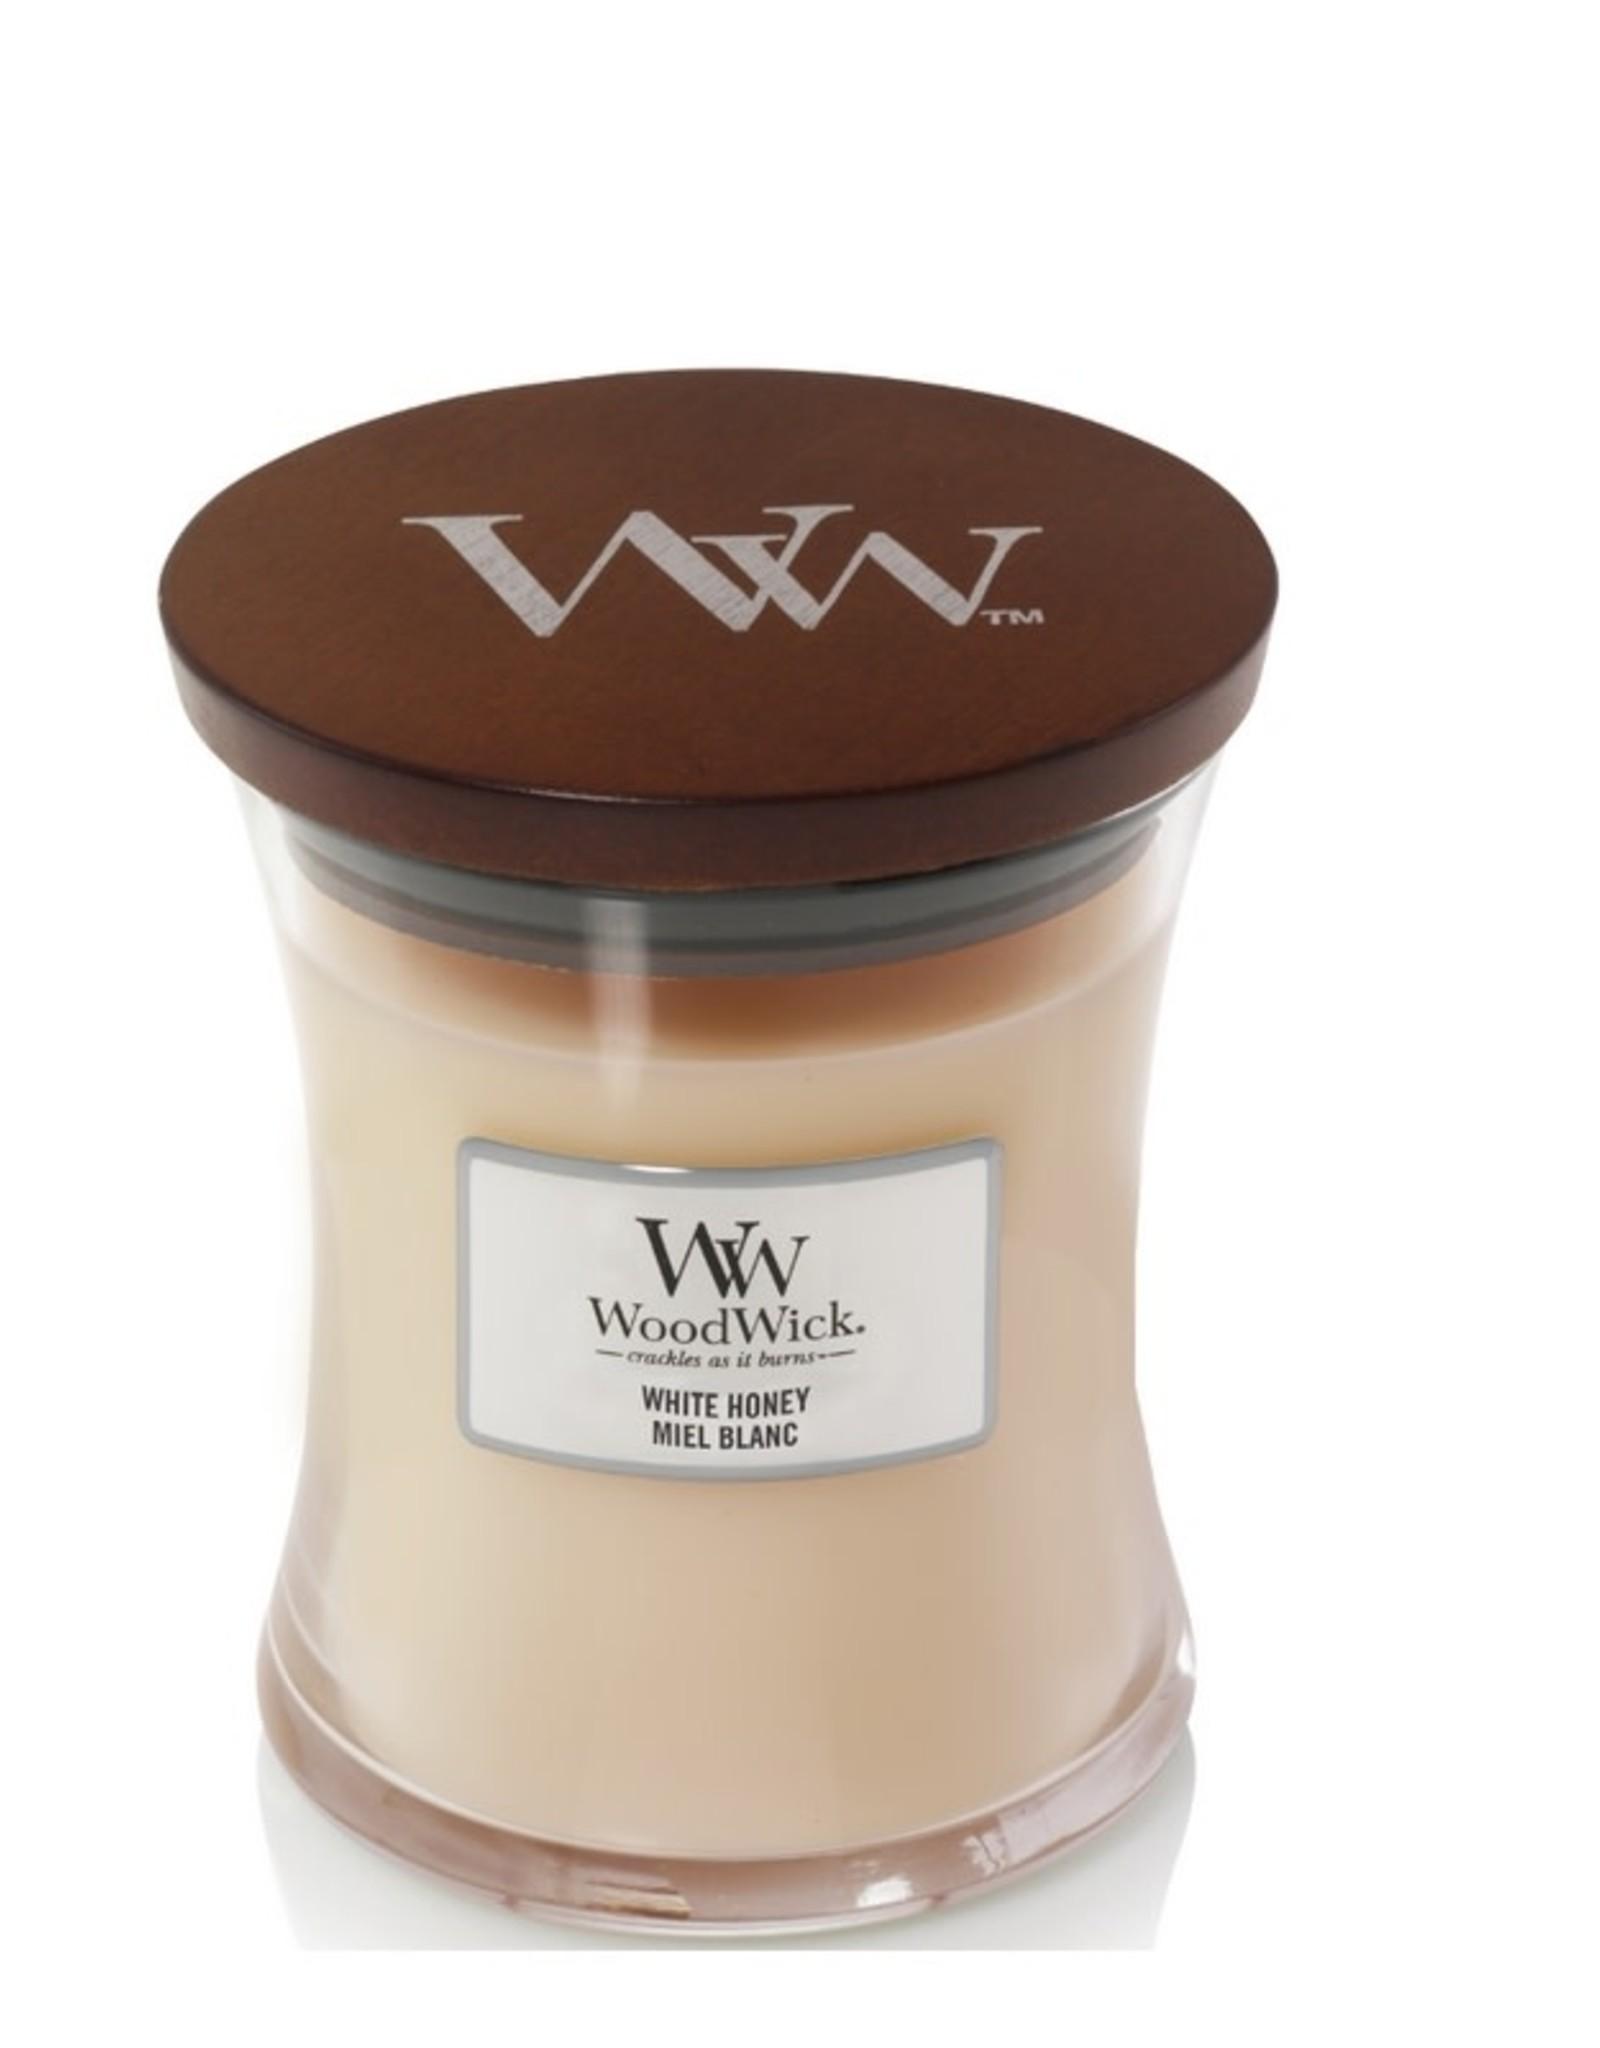 Woodwick Woodwick White Honey Medium Candle